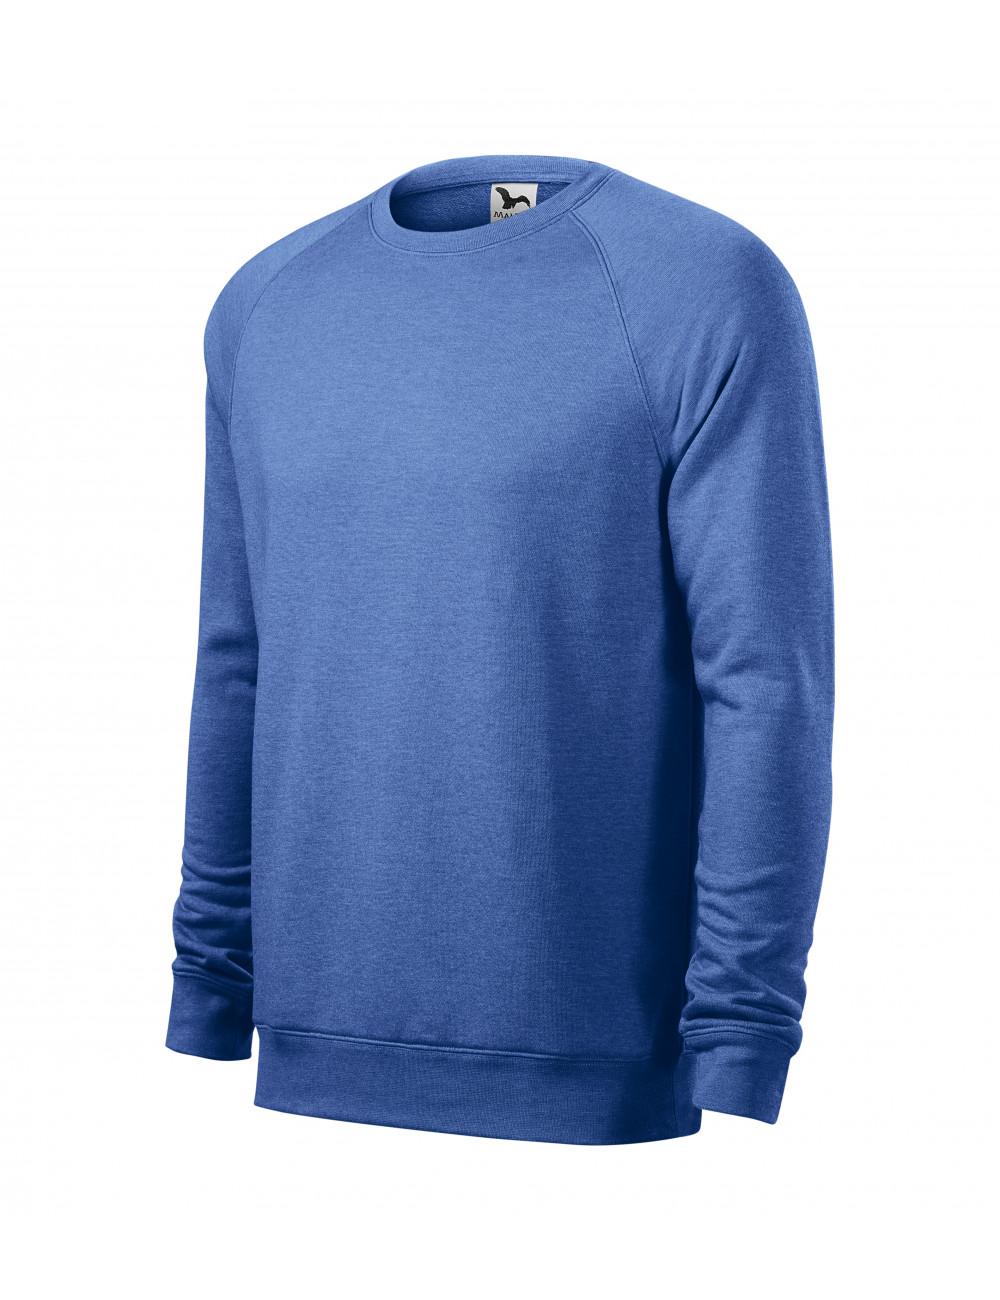 Adler MALFINI Bluza męska Merger 415 niebieski melanż